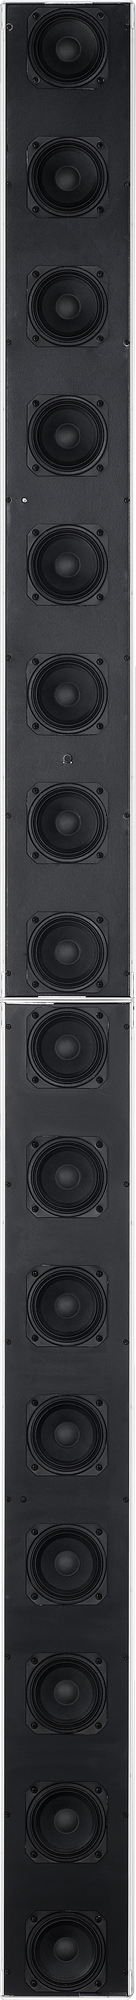 Tannoy  QFLEX 16LS WP WHITE - Installatiespeaker